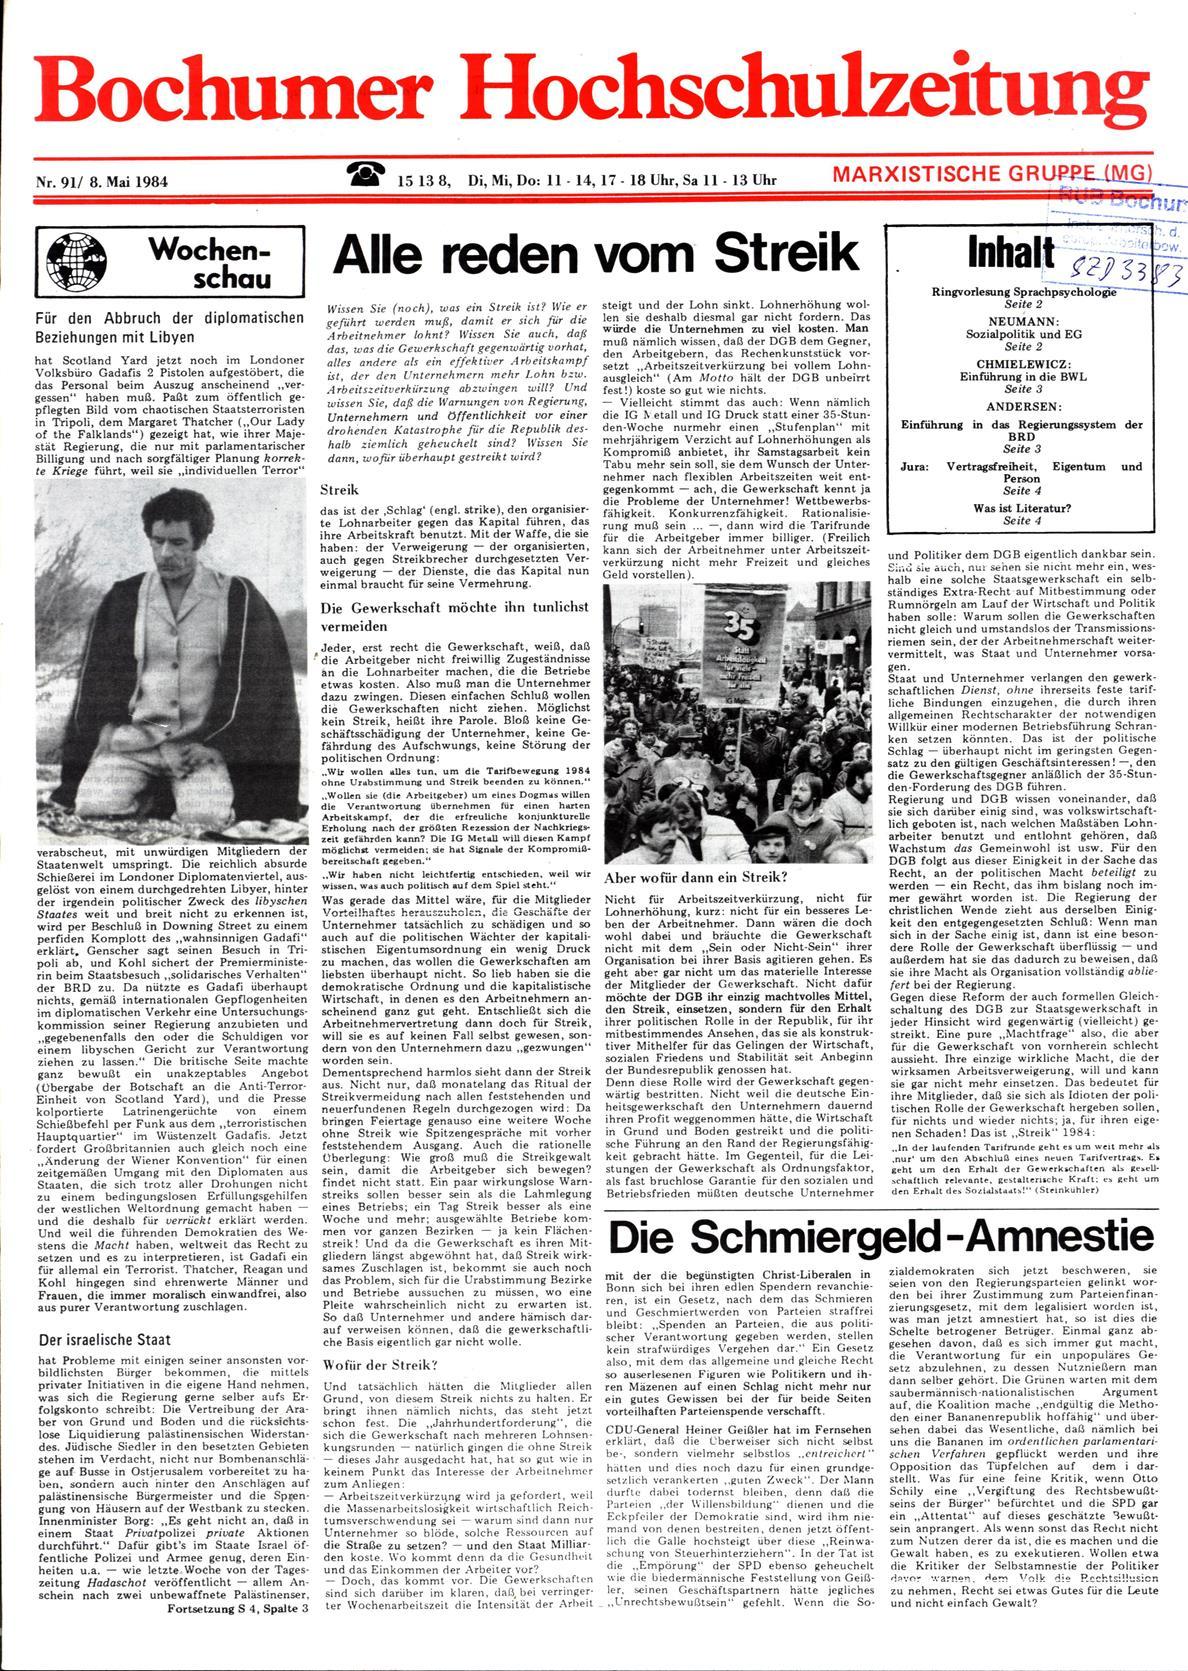 Bochum_BHZ_19840508_091_001